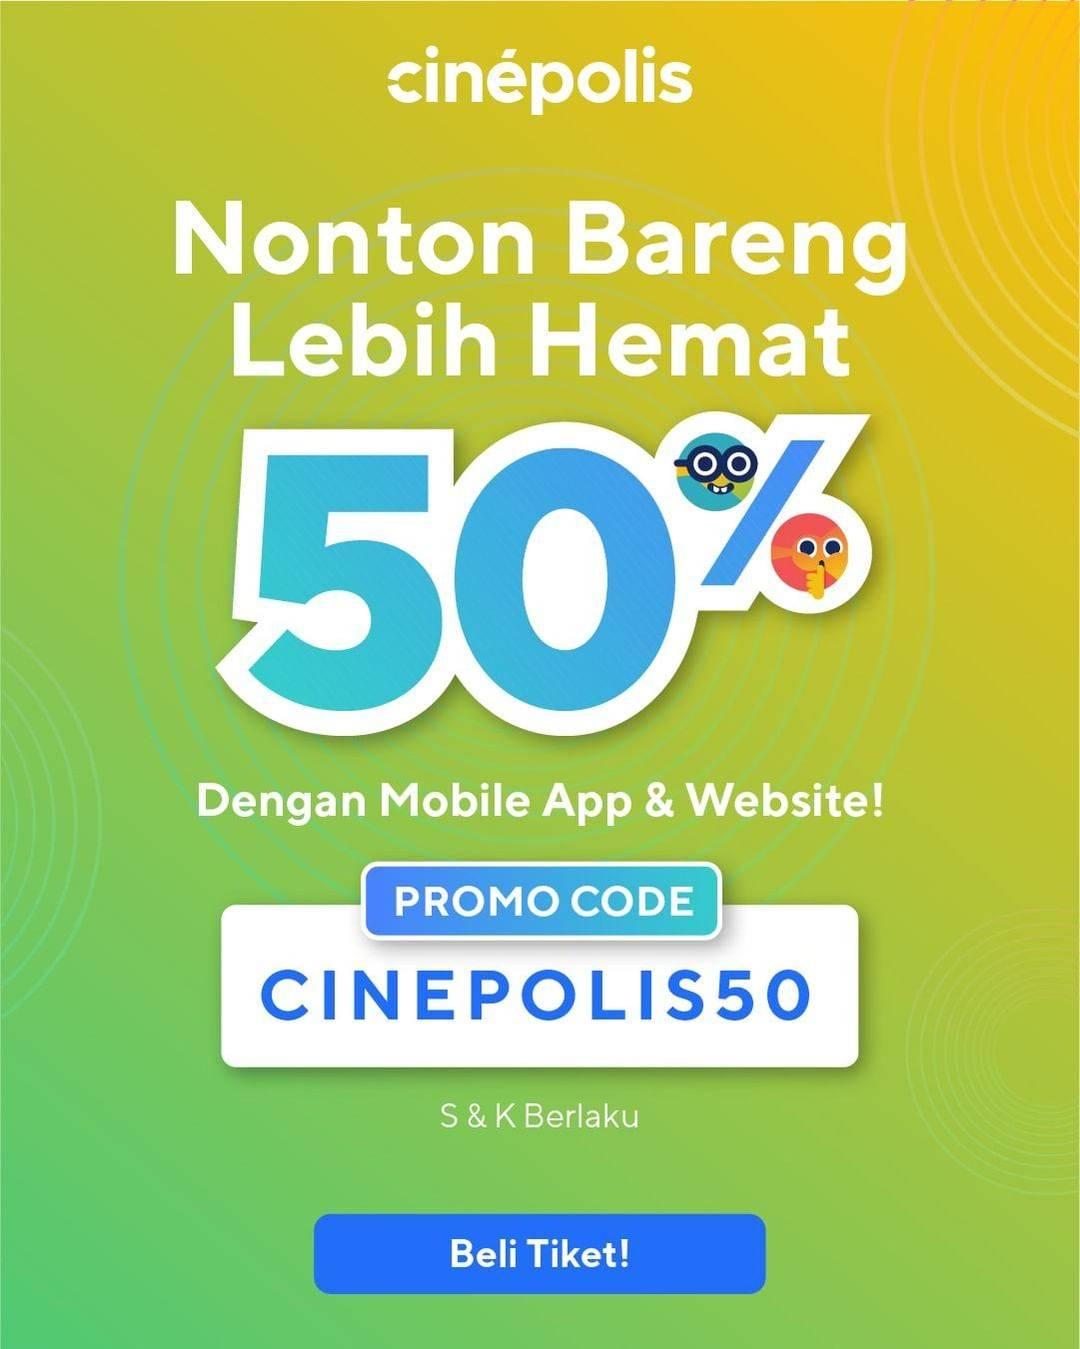 Cinepolis Promo Voucher Diskon 50% Pembelian Melalui App/Website